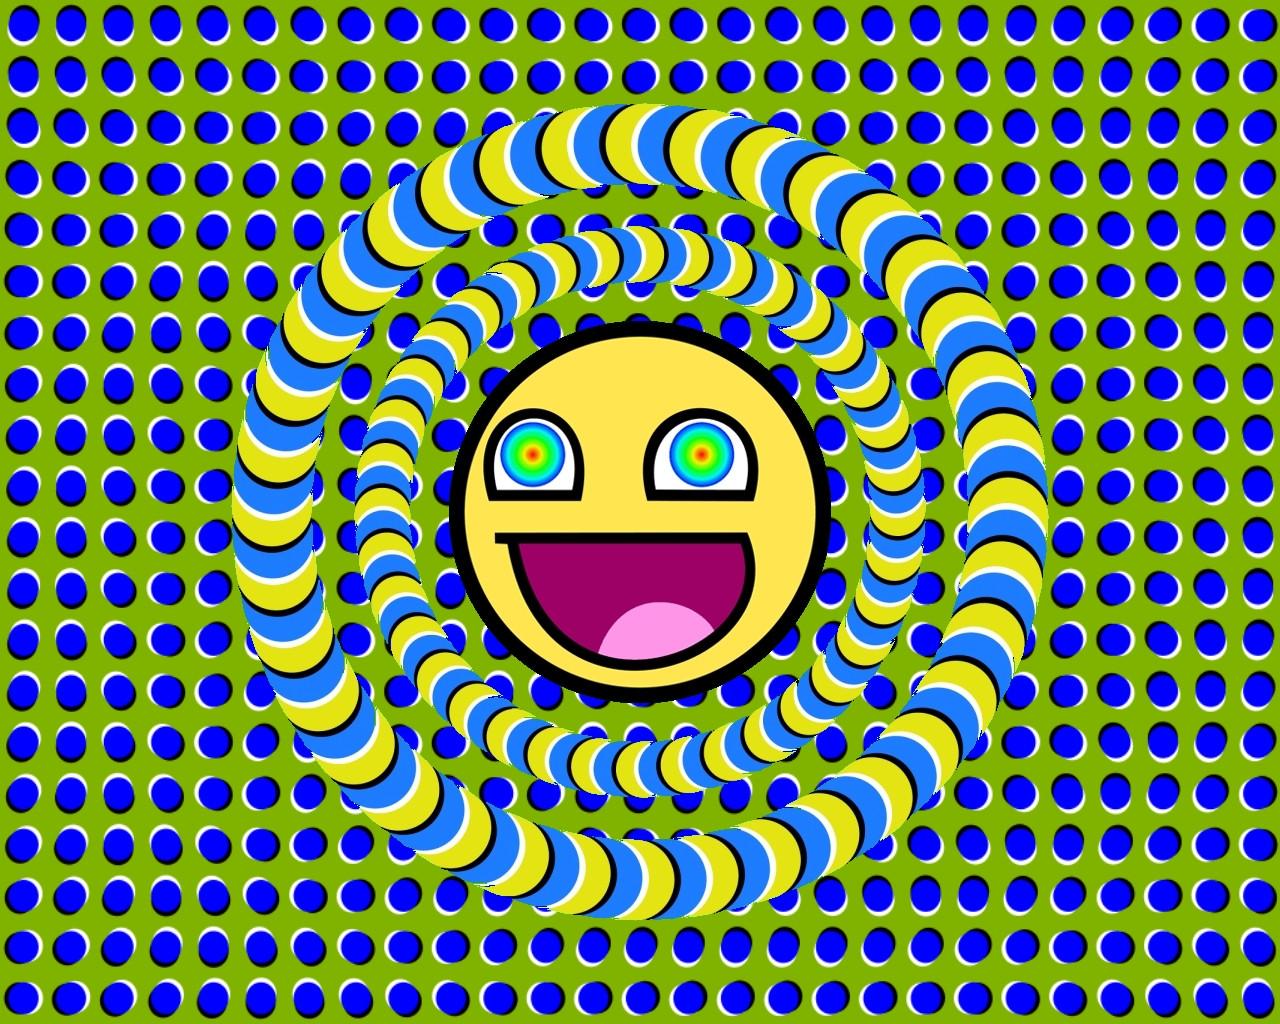 Moving Illusions 1280x1024